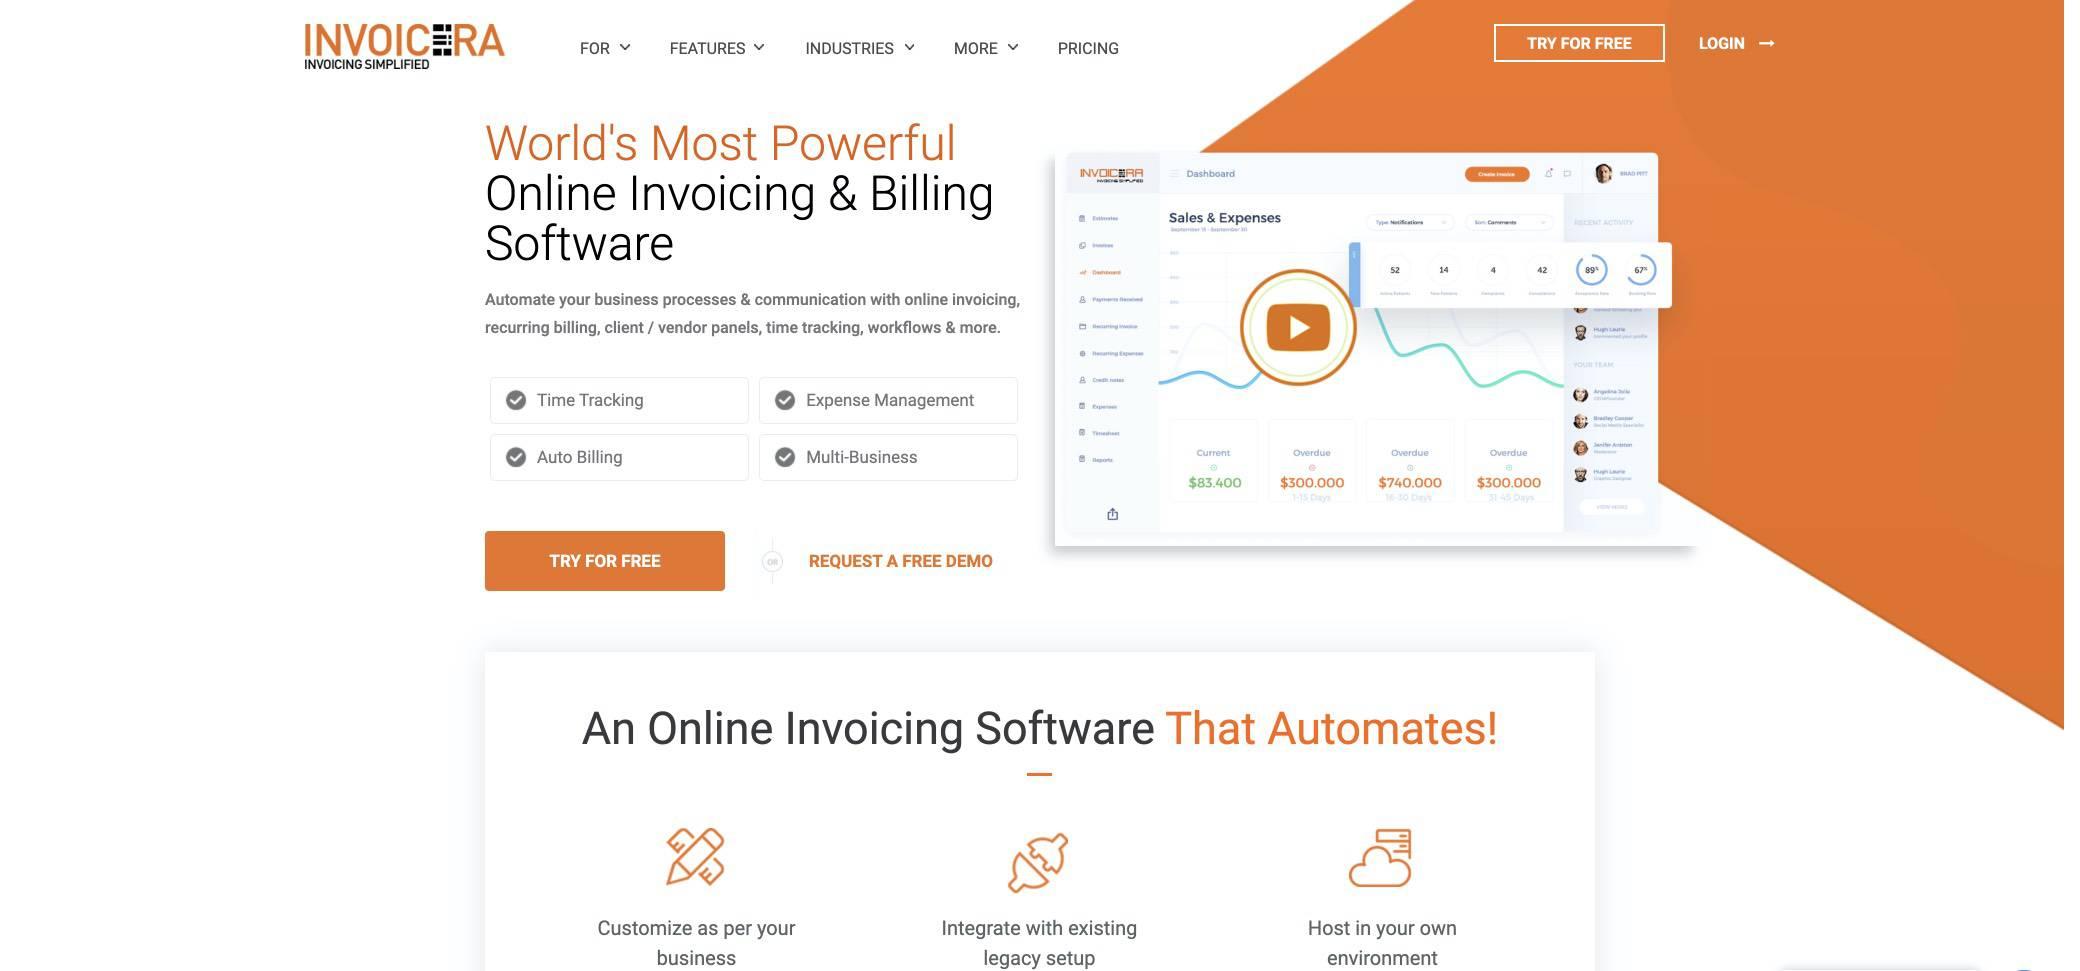 invoicera screenshot